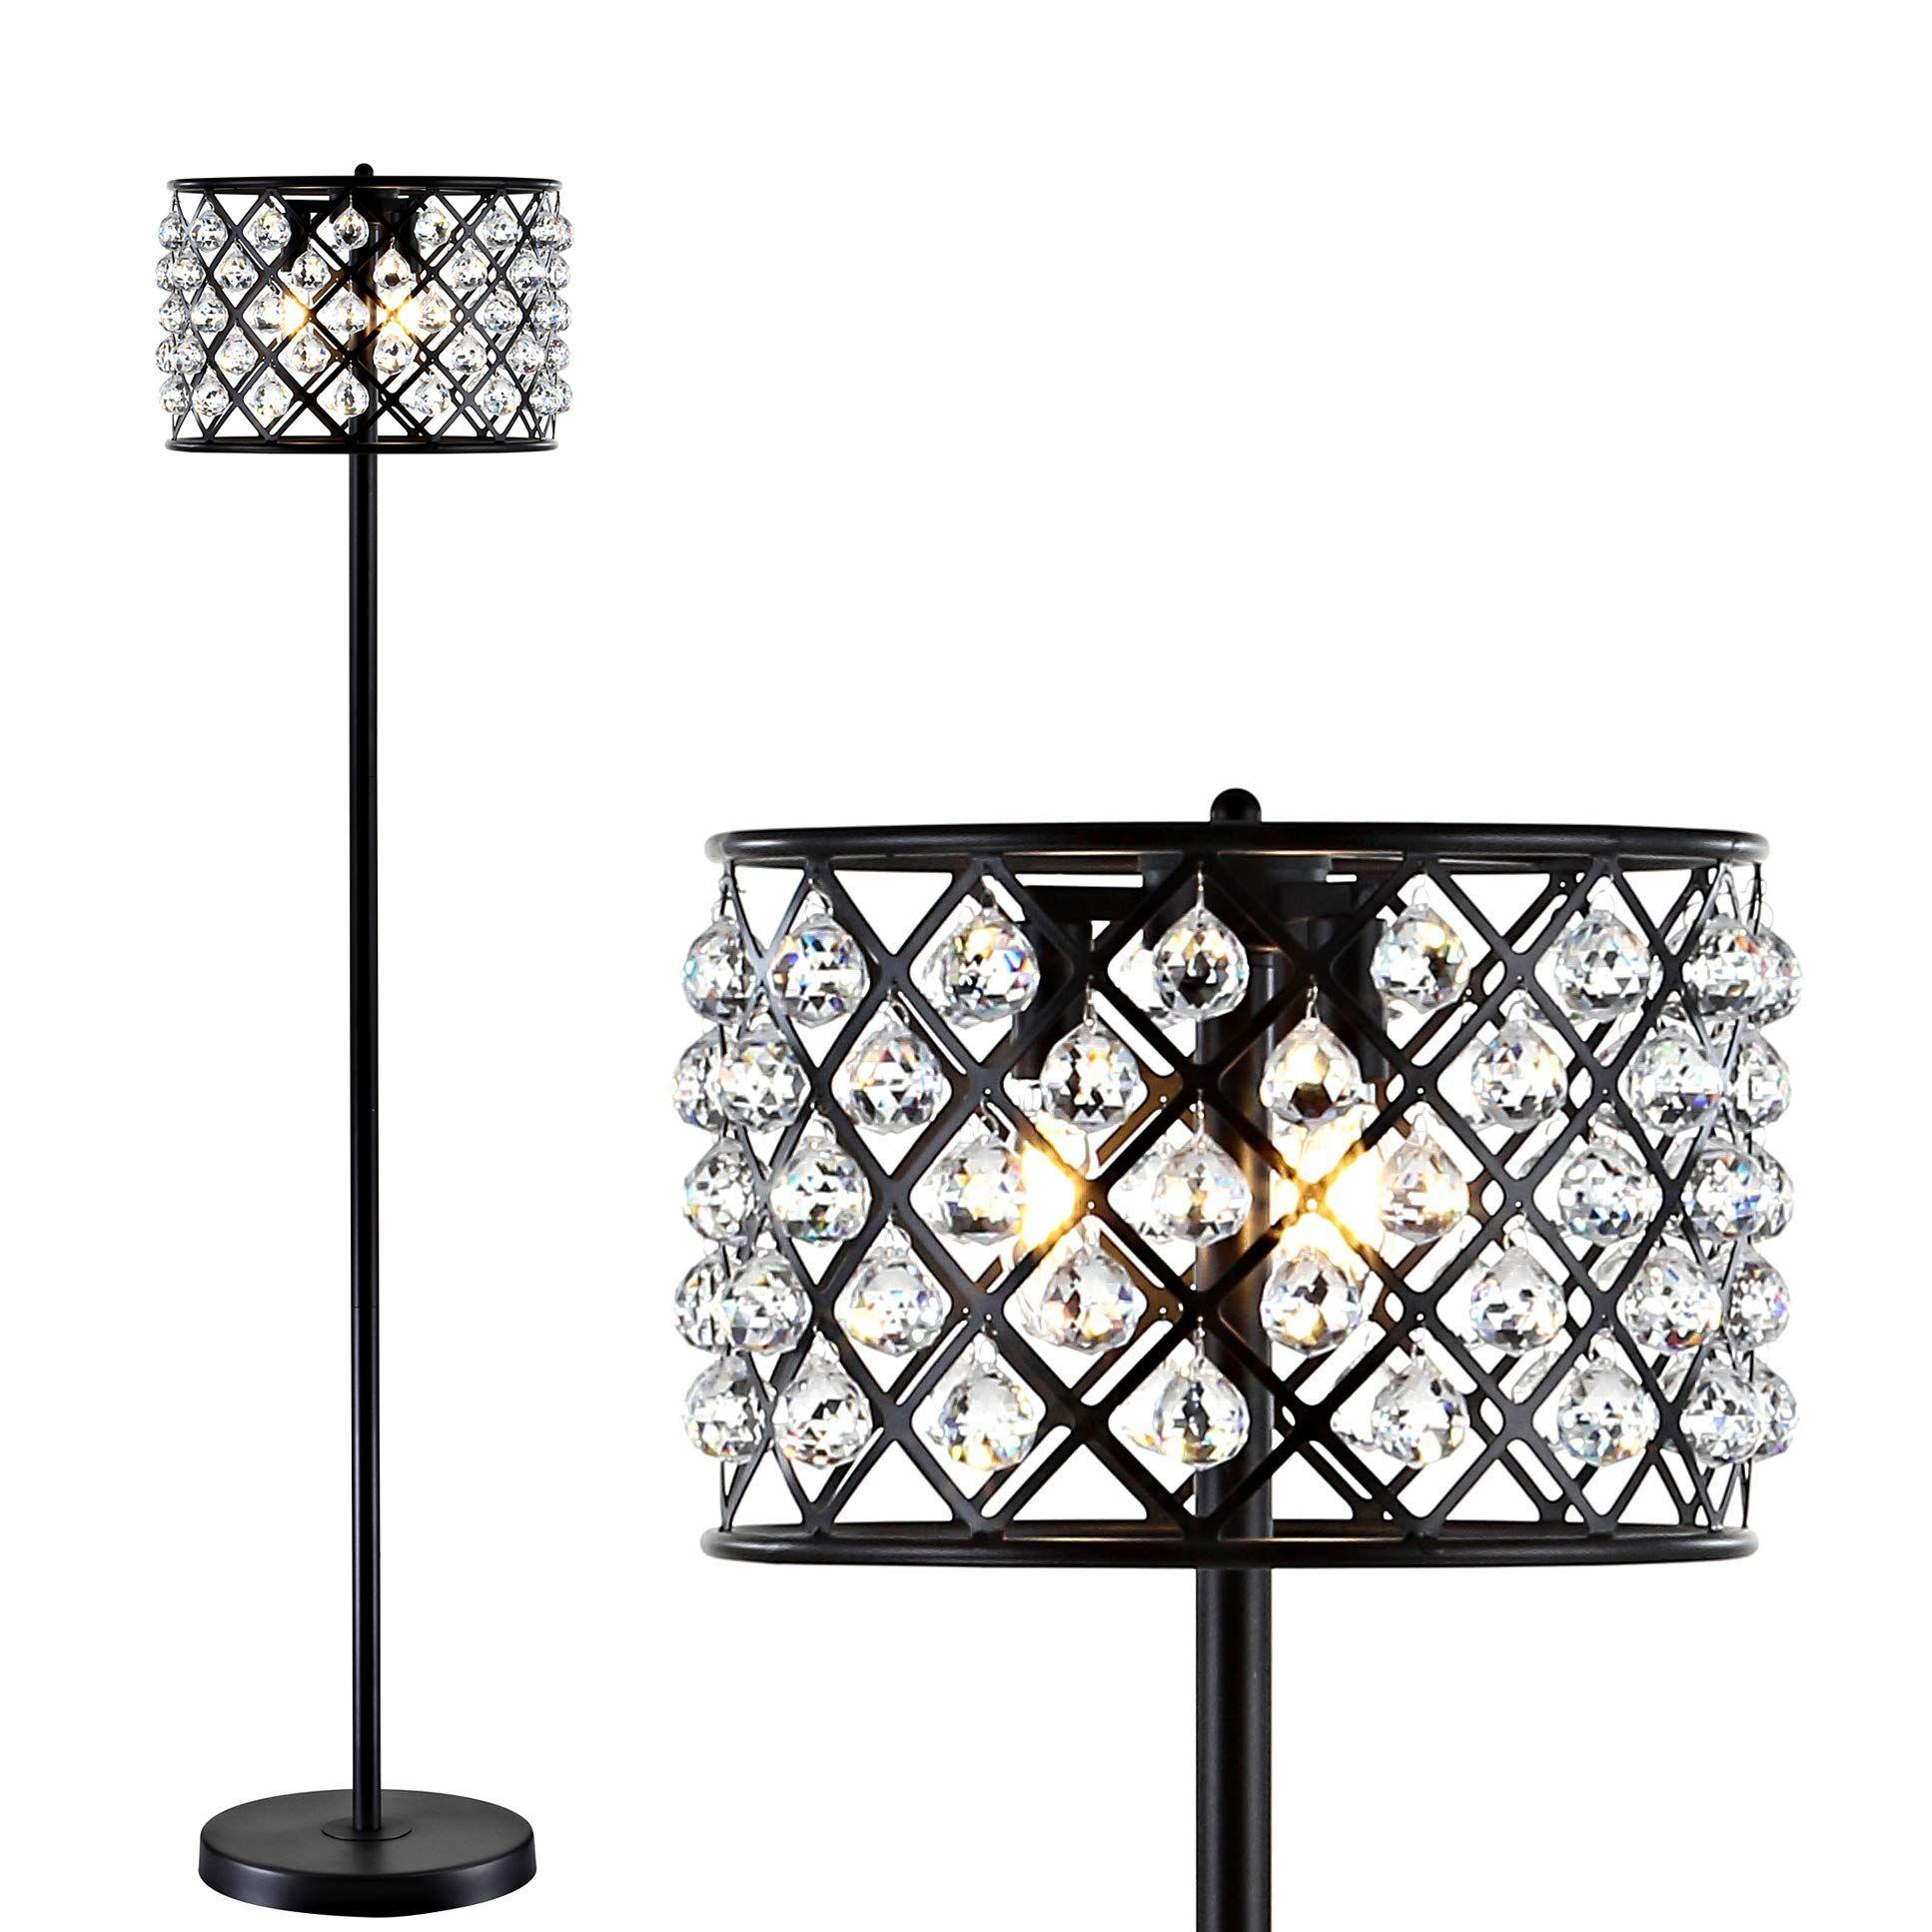 JONATHAN. 15 Unique Artistic Floor Lamps to Light Your Bedroom